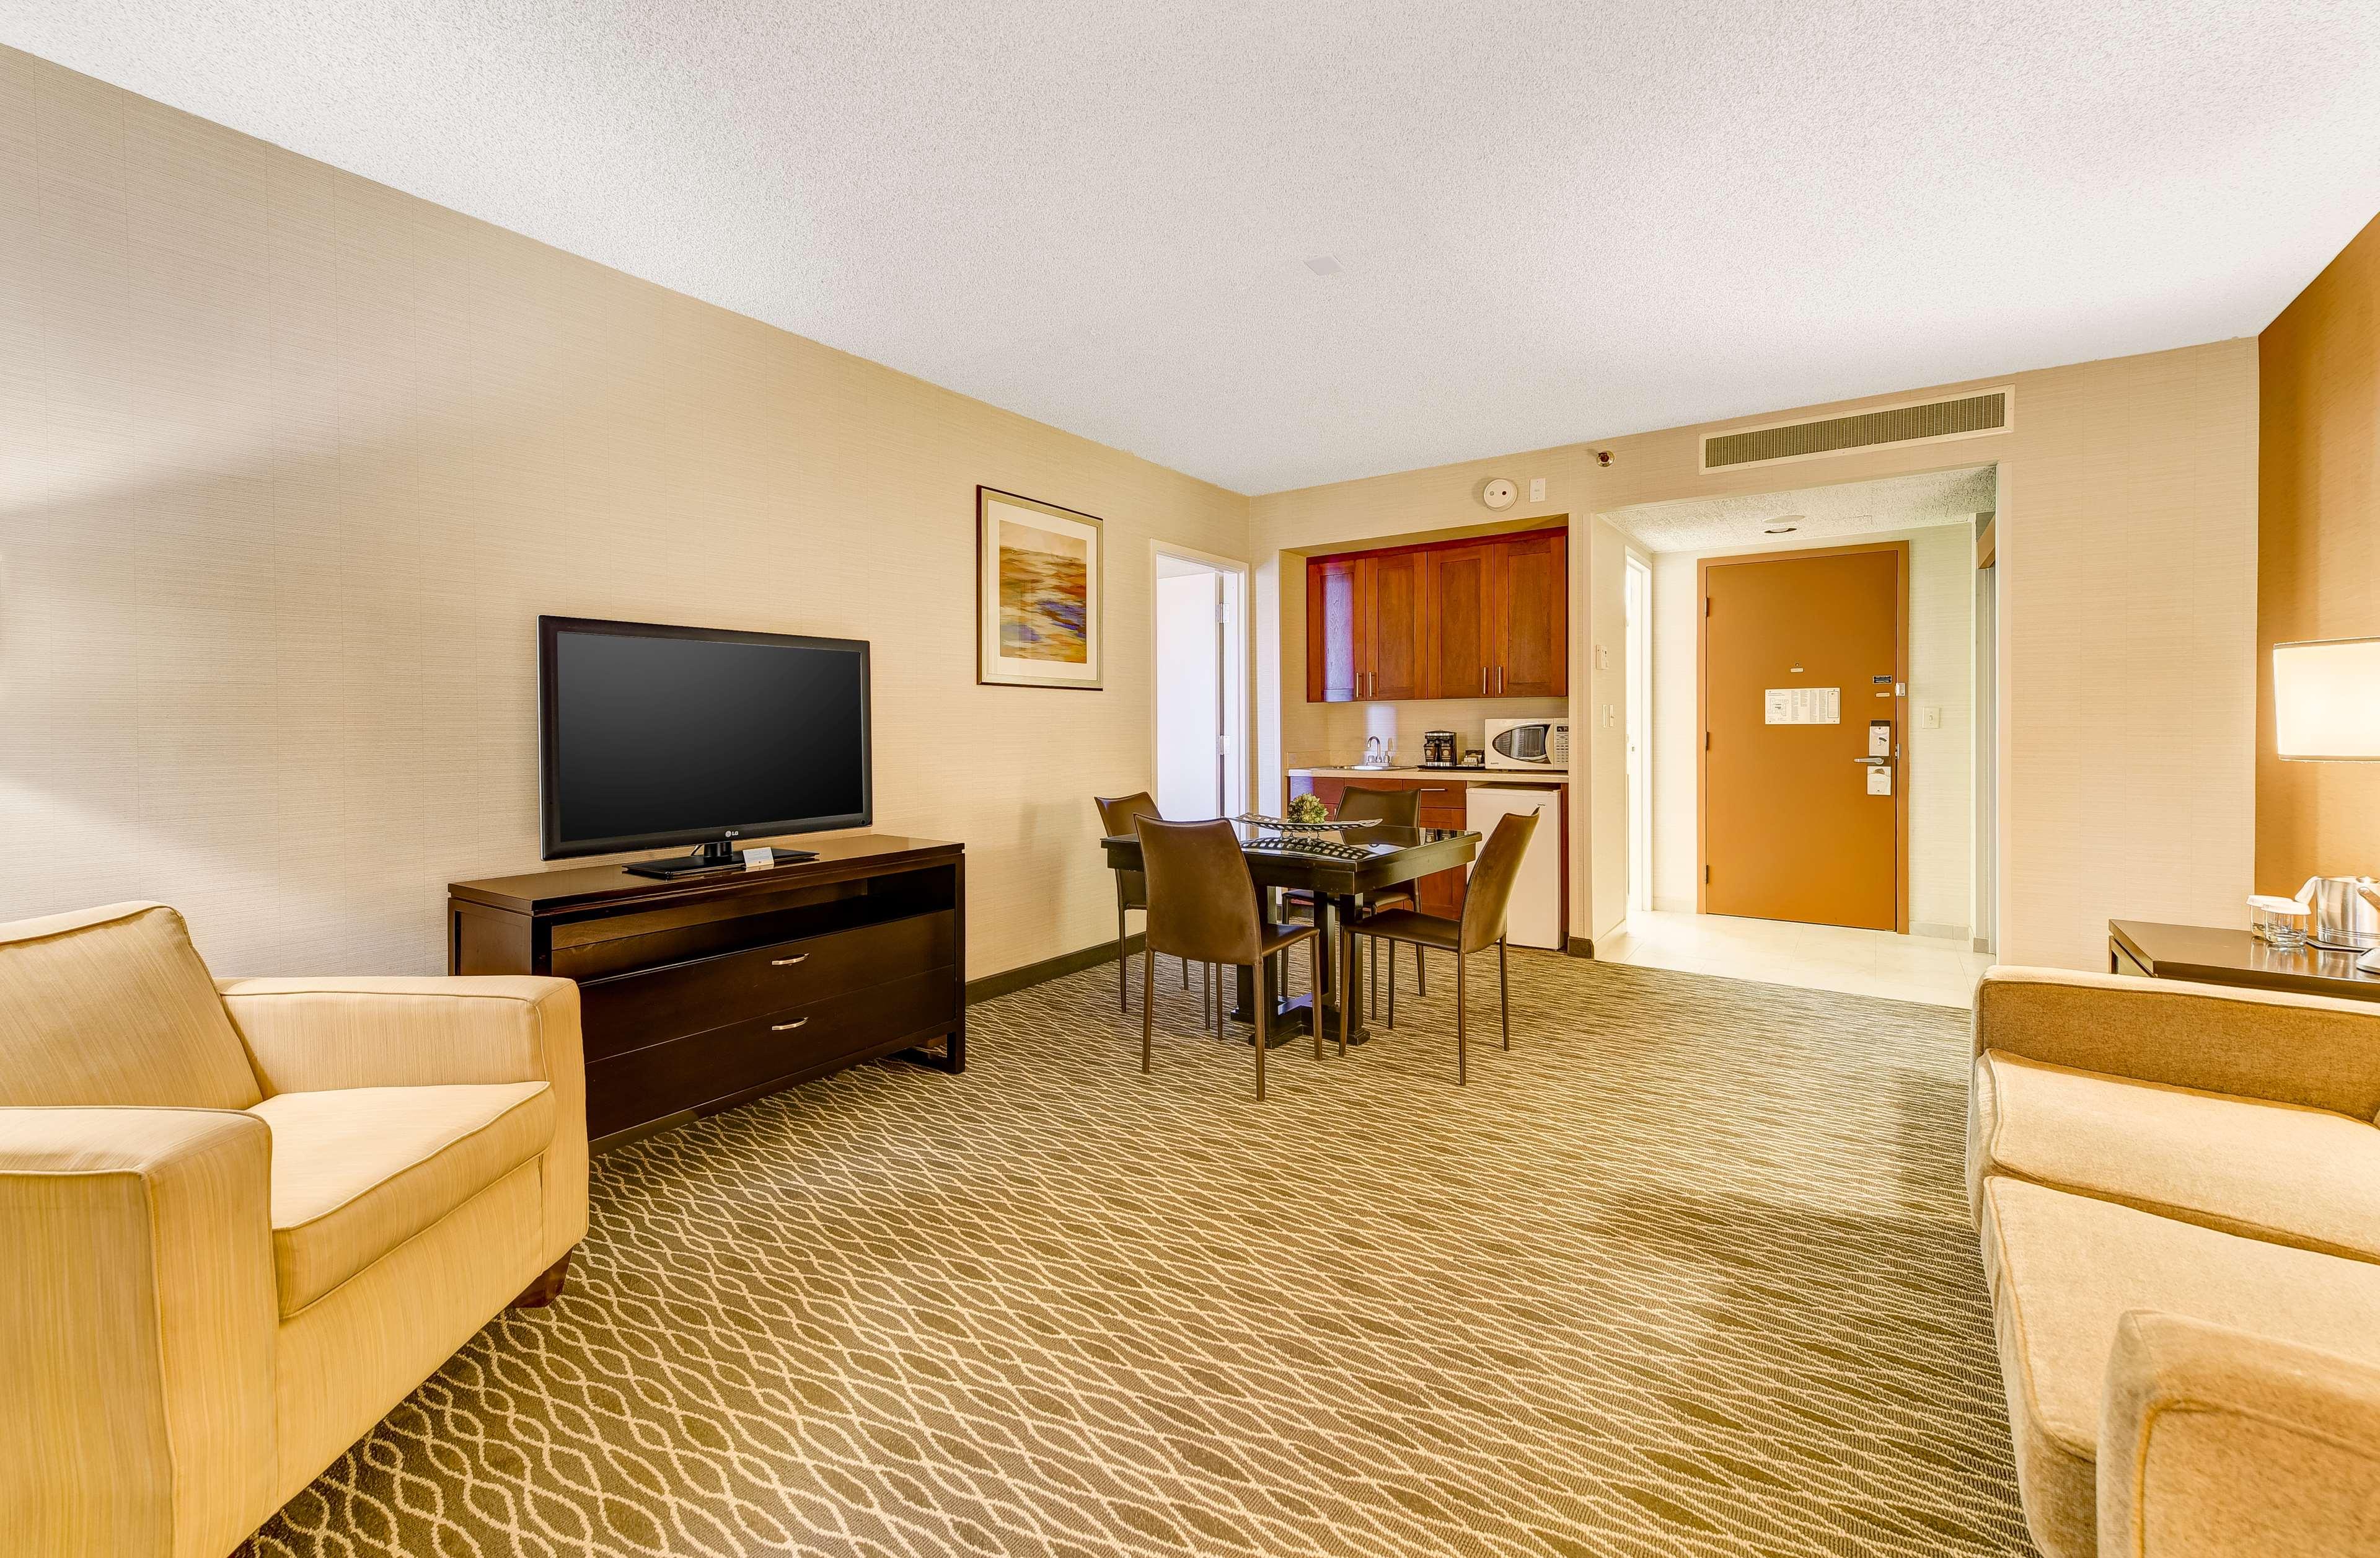 DoubleTree by Hilton Hotel Anaheim - Orange County image 43